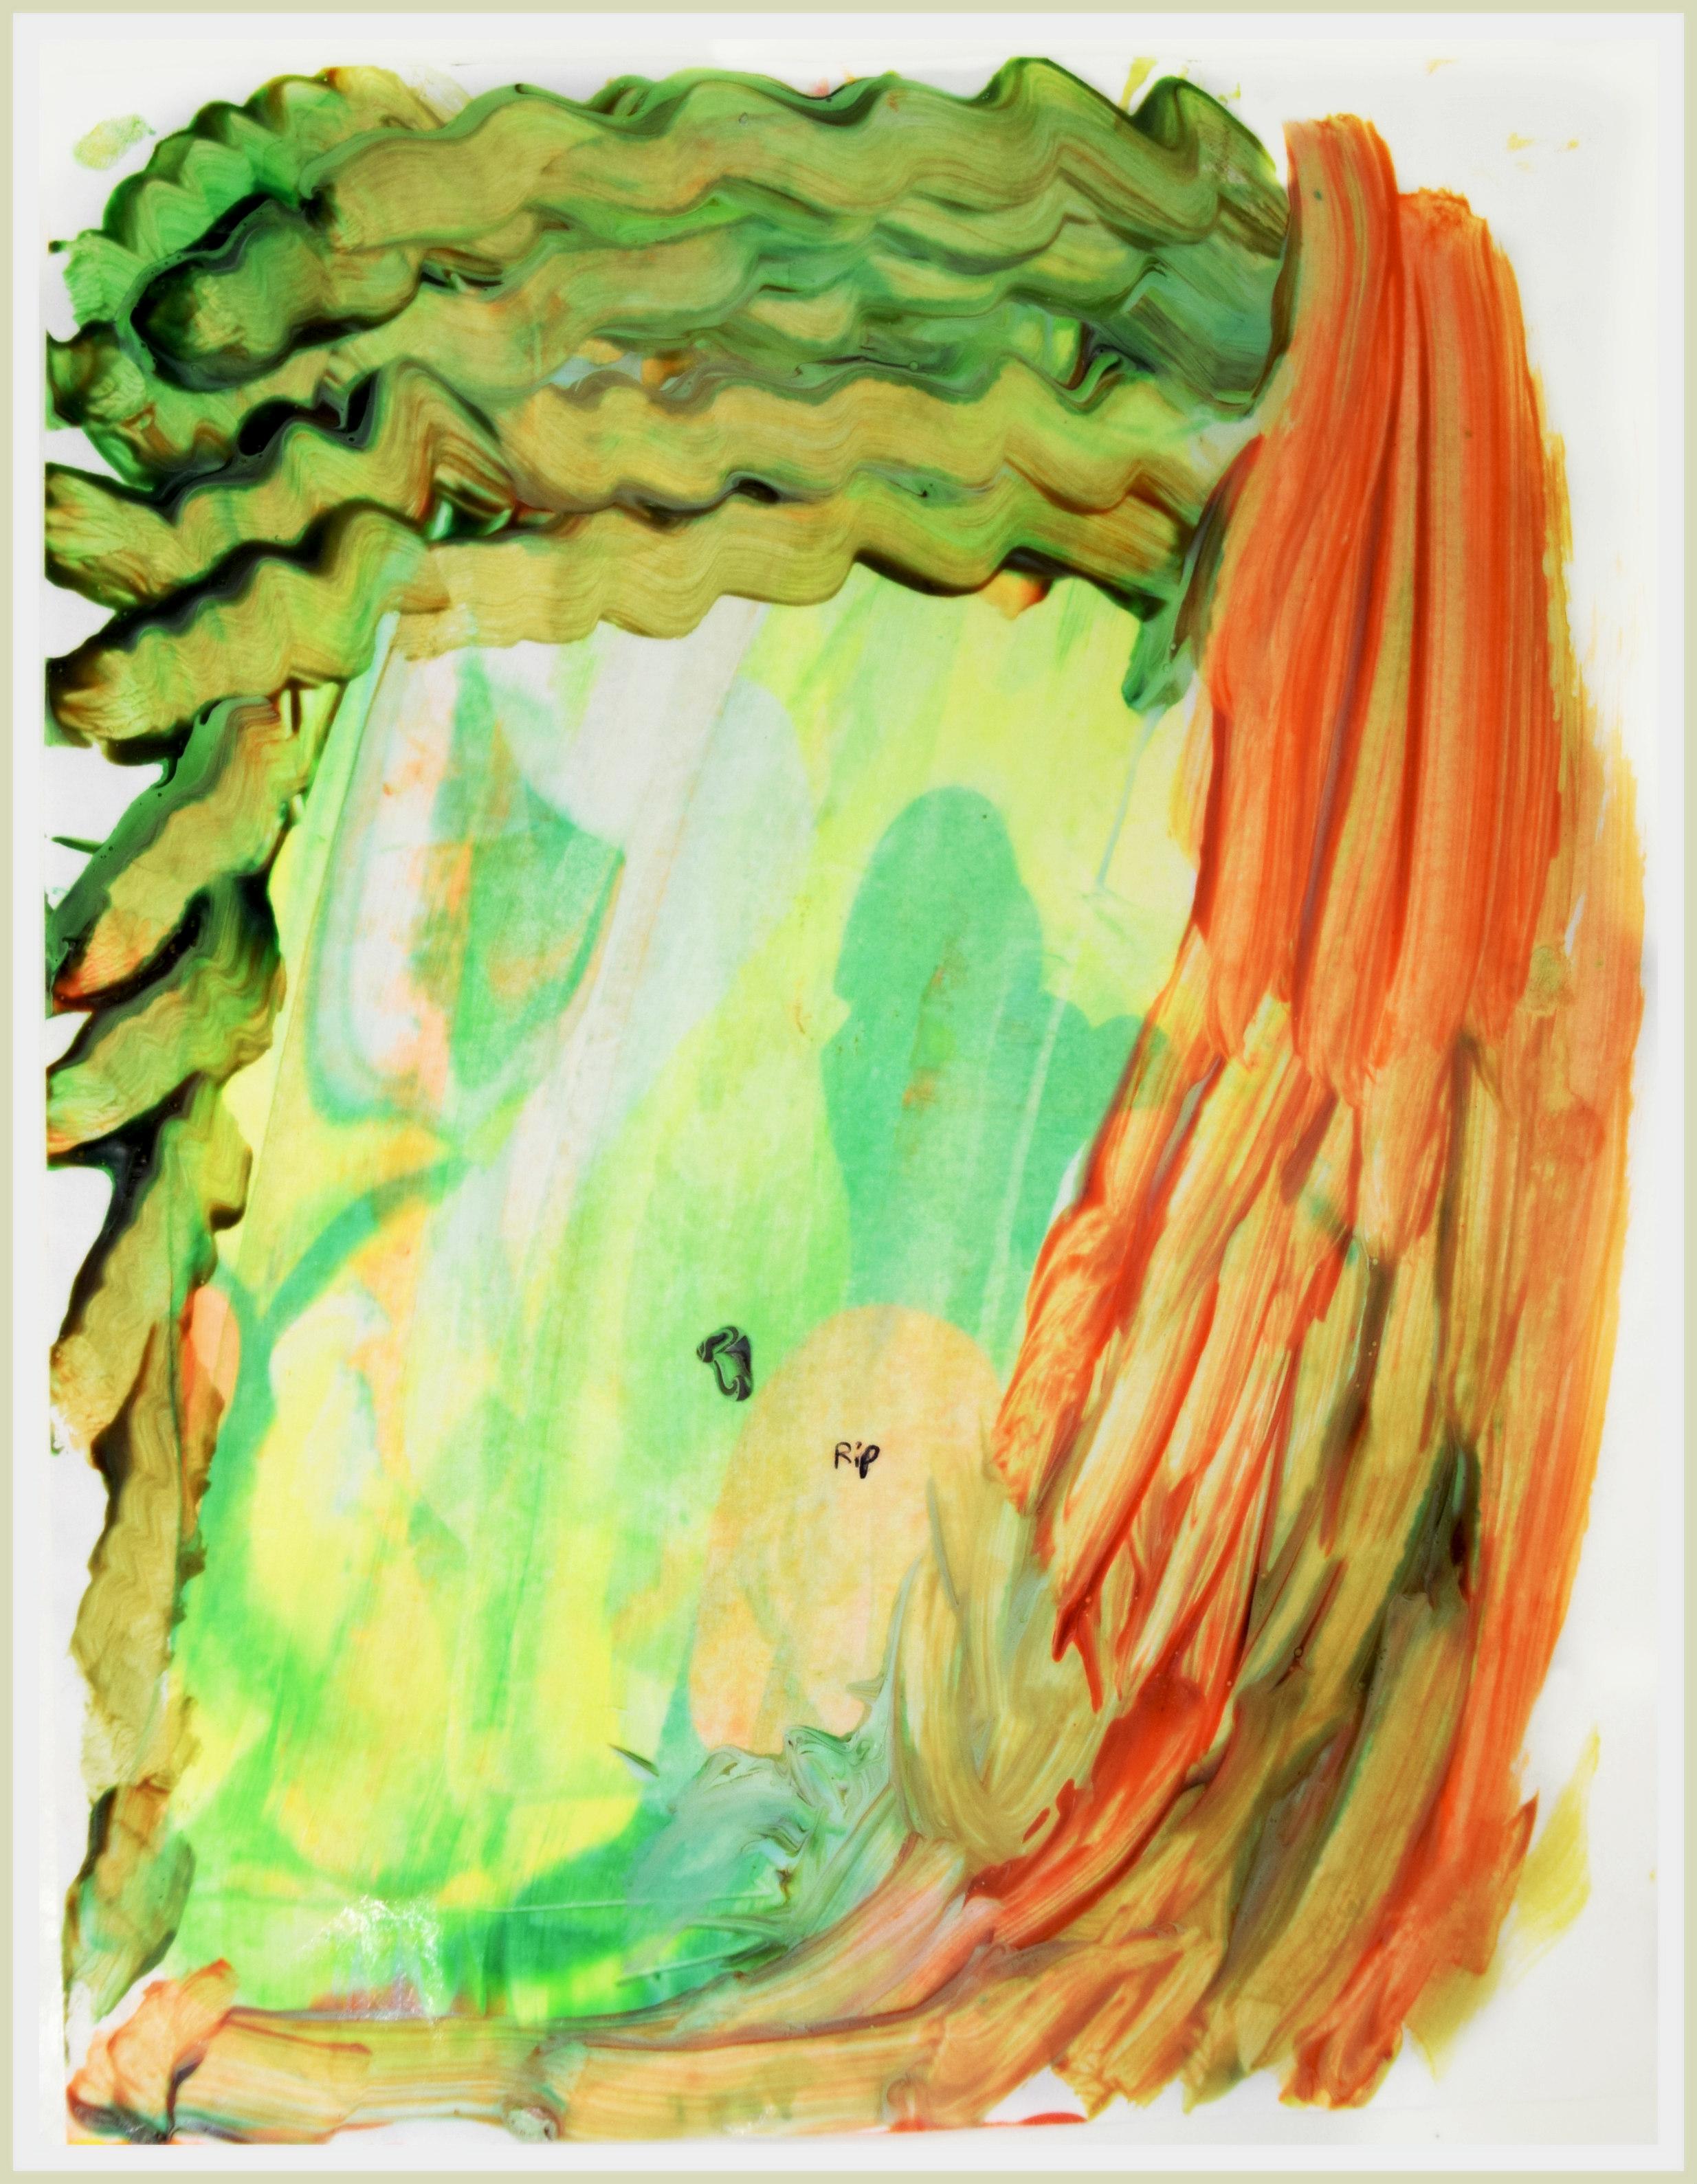 Halloween Stephanie Bedell 2016 Print $35